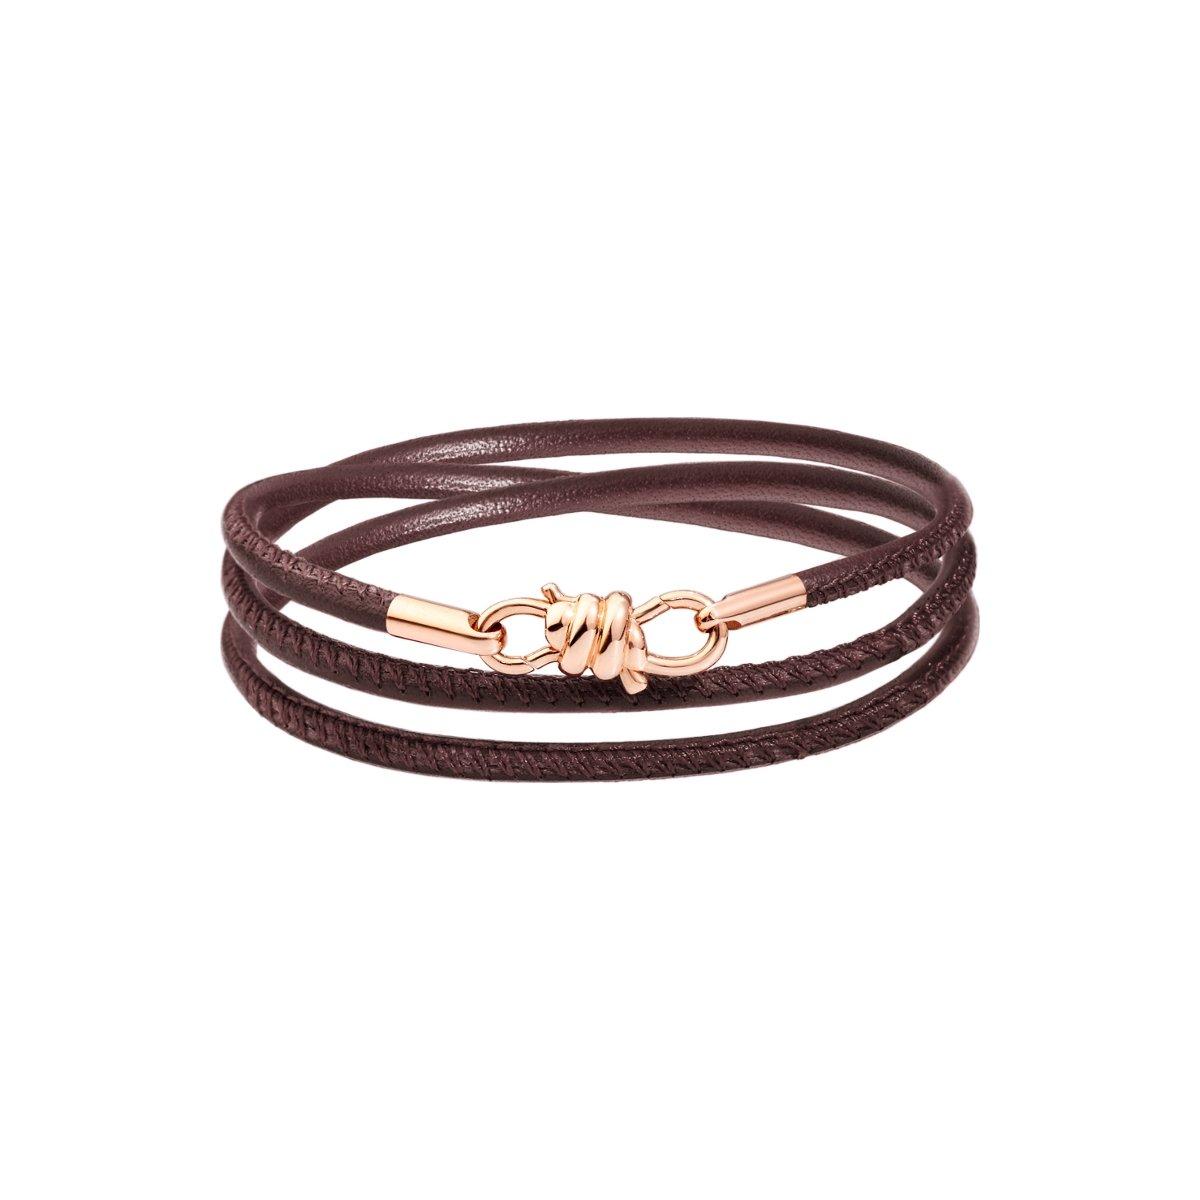 Bracelet sur cordon DoDo Nodo Bracelet Nodo en or rose et cuir moka, 17cm vue 1